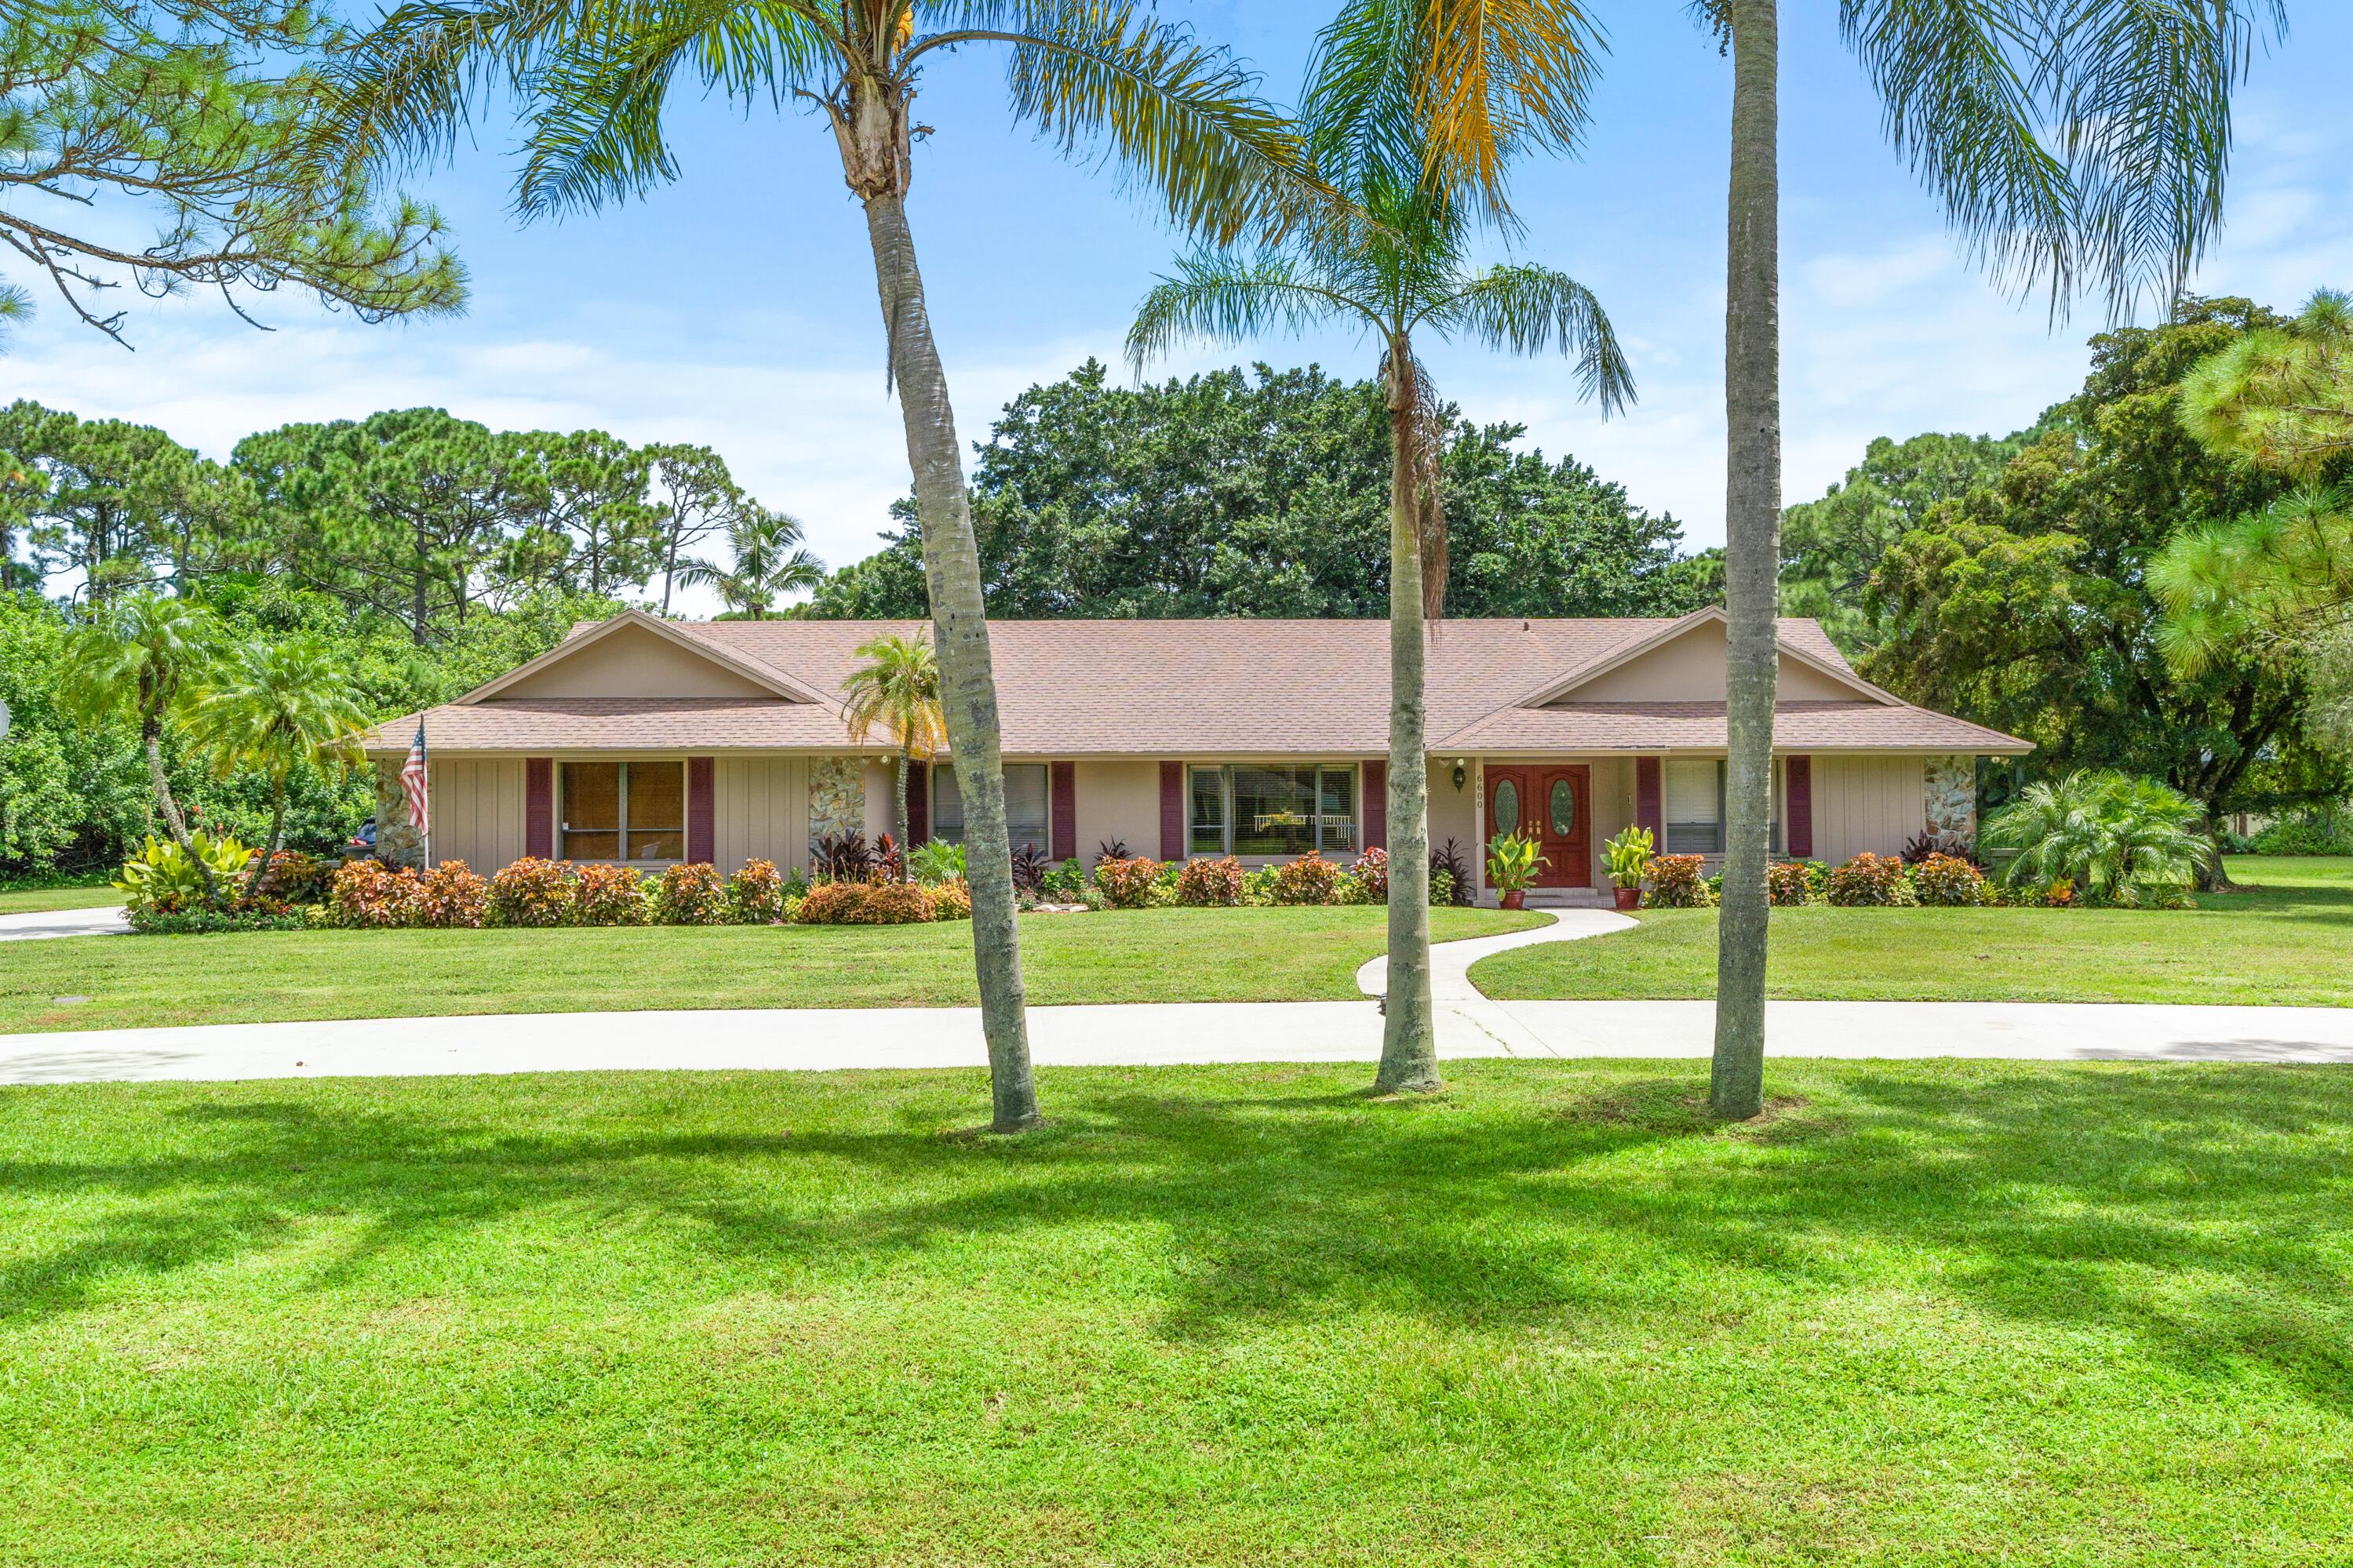 6600 141st N Lane, West Palm Beach, FL 33418